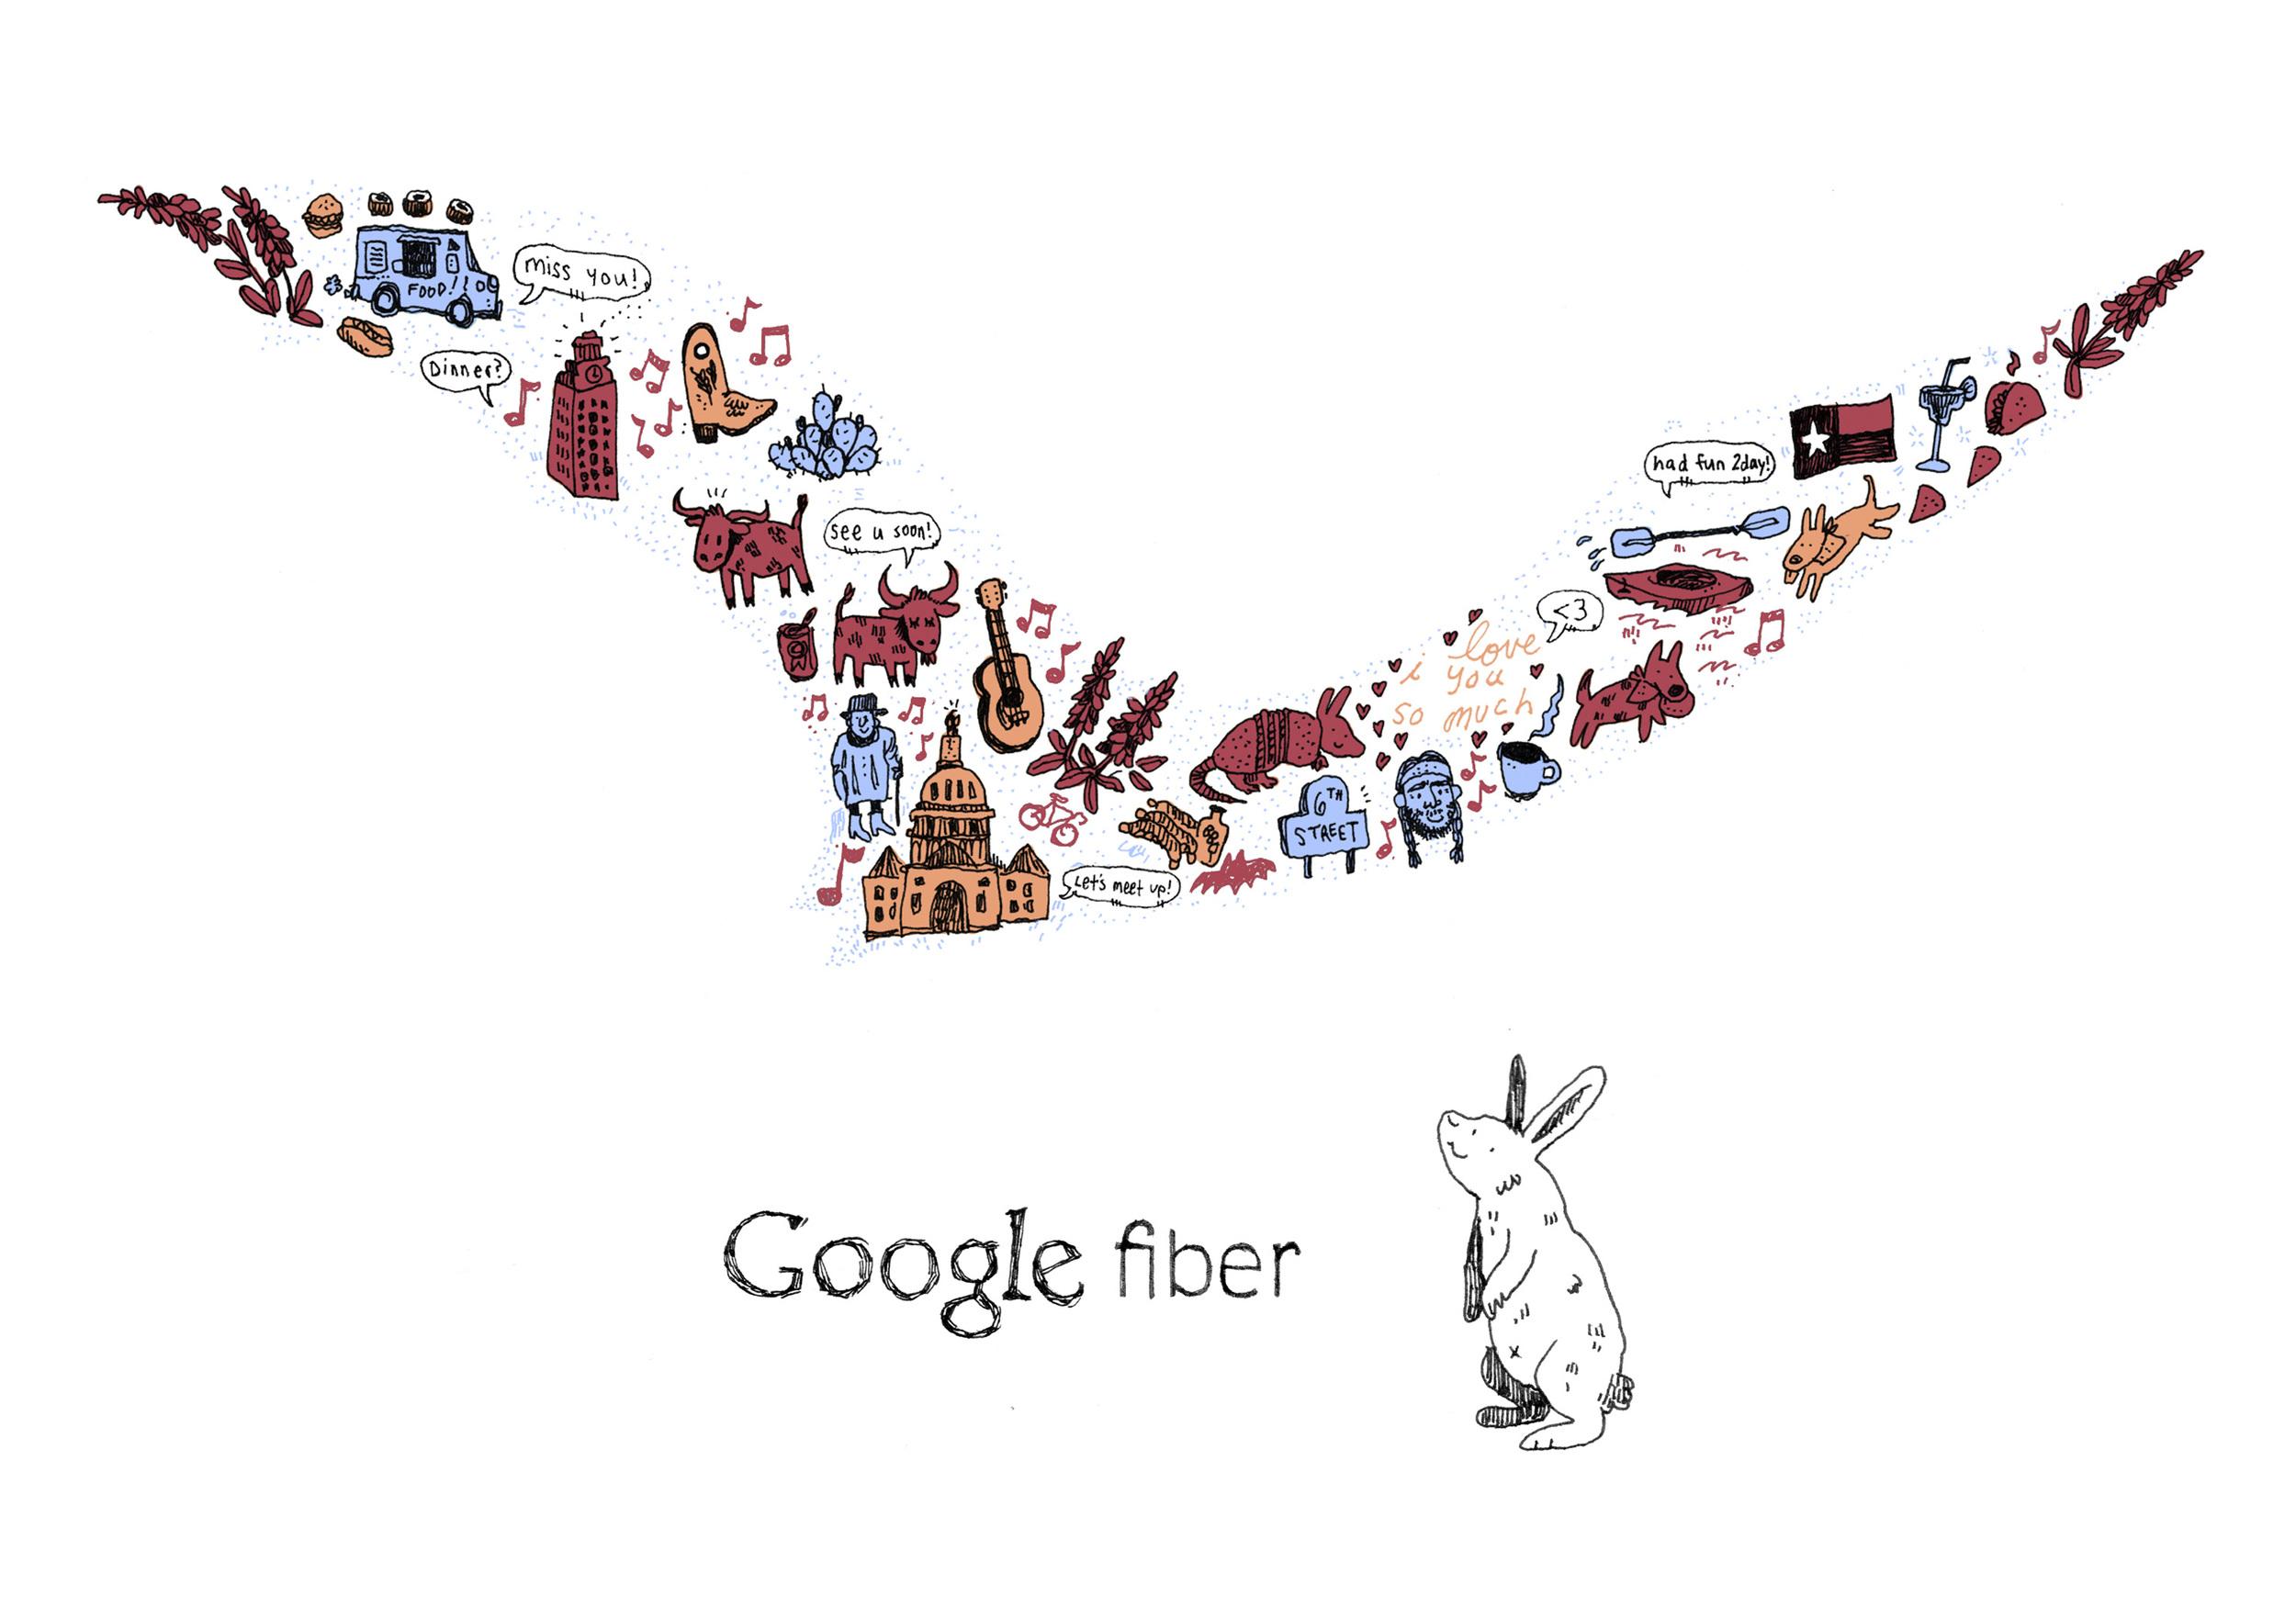 googlefiber.jpg